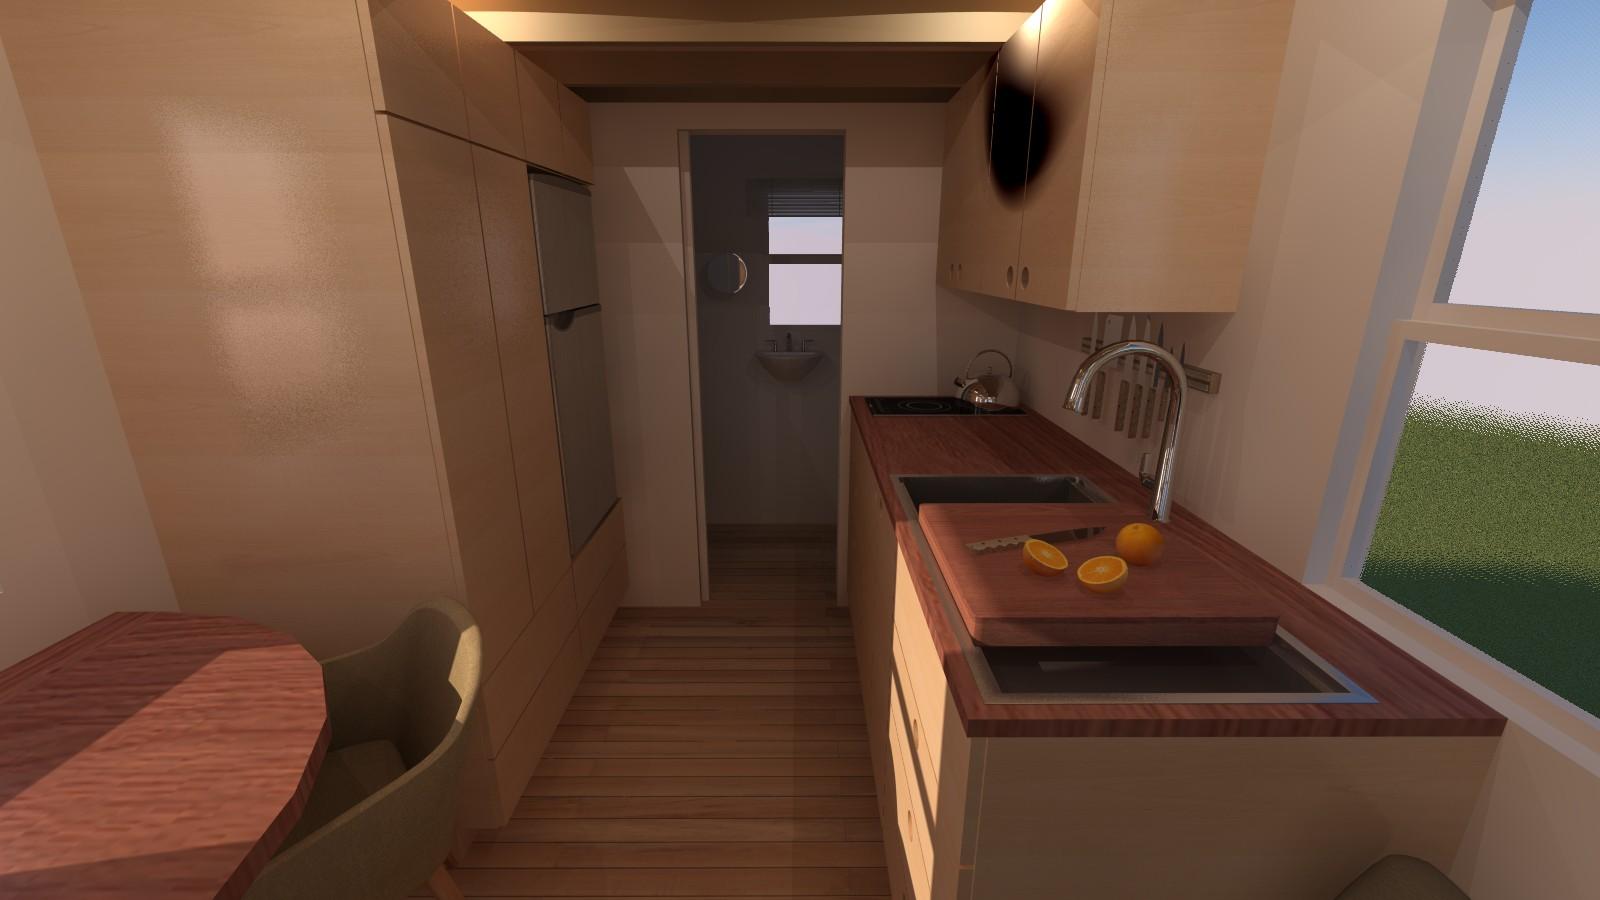 Caspar 20 Tiny House Interior Kitchen